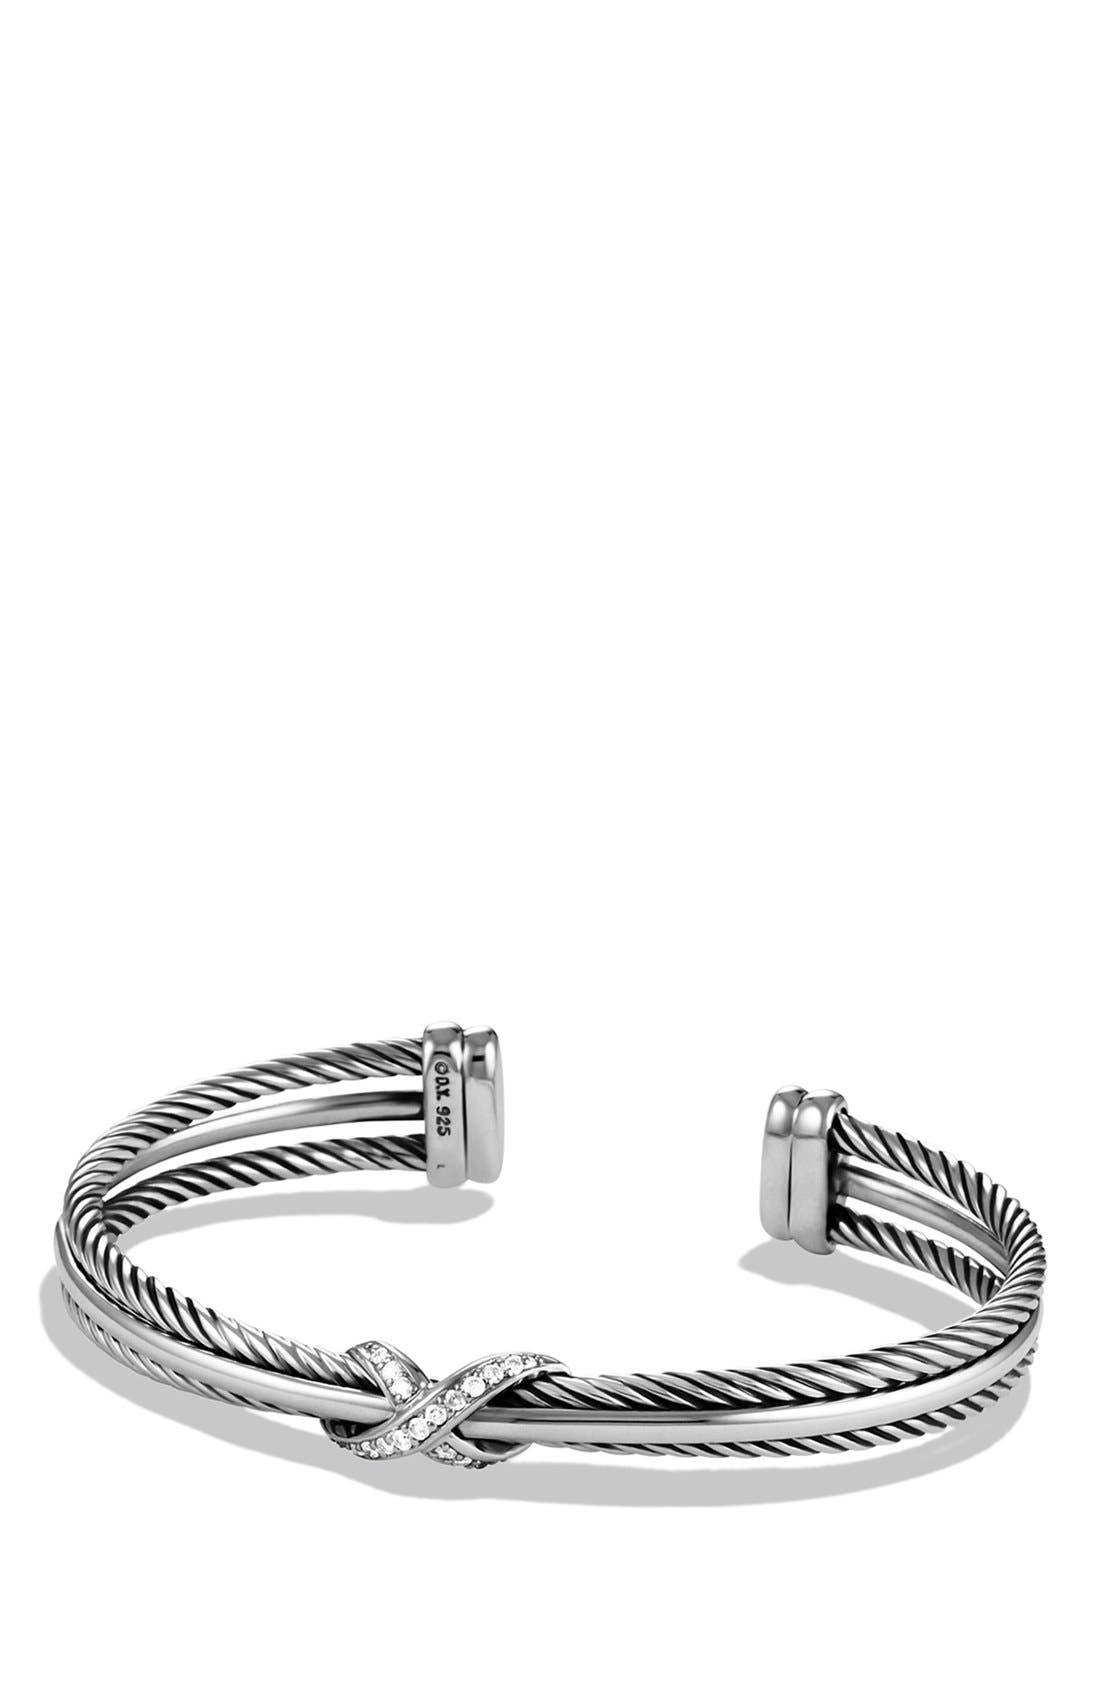 Main Image - David Yurman 'X' Crossover Cuff with Diamonds